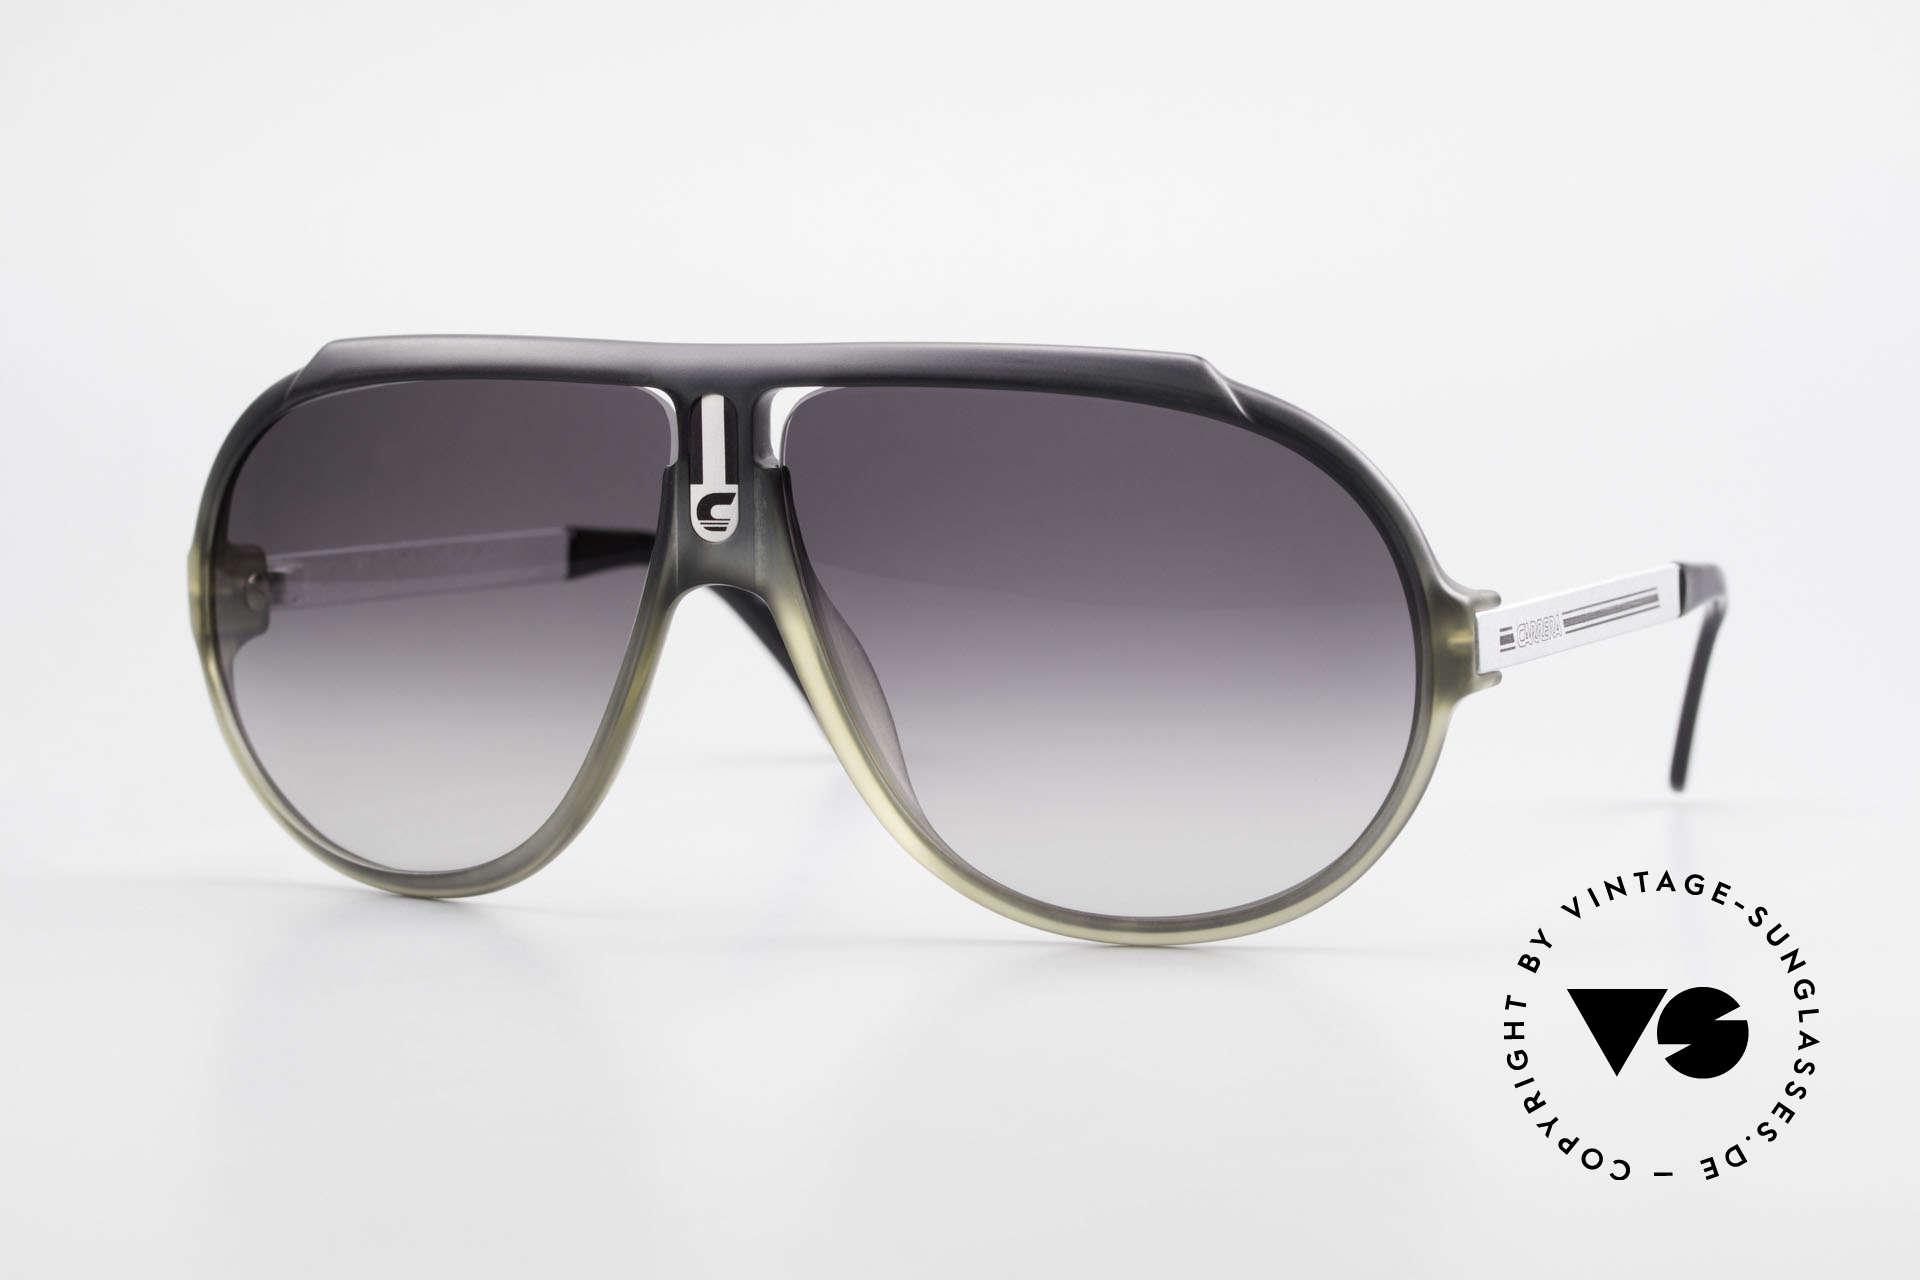 Carrera 5512 80's Miami Vice Sunglasses, legendary 1980's vintage CARRERA designer sunglasses, Made for Men